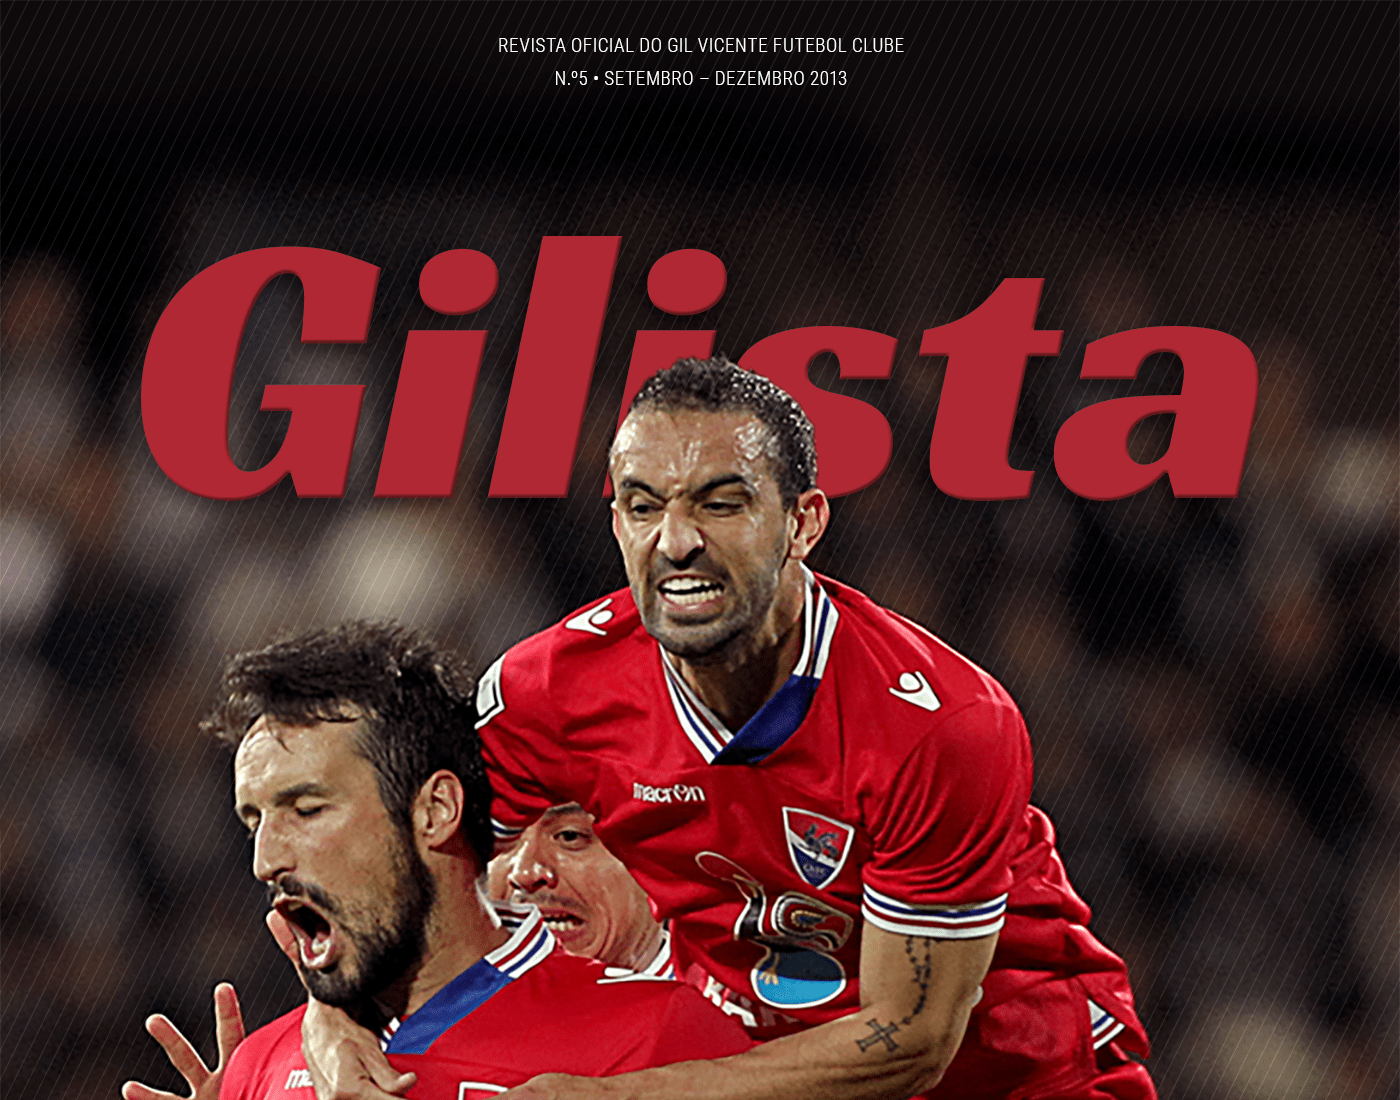 gvfc gilista gil vicente soccer football futebol ISD clube revista magazine N5